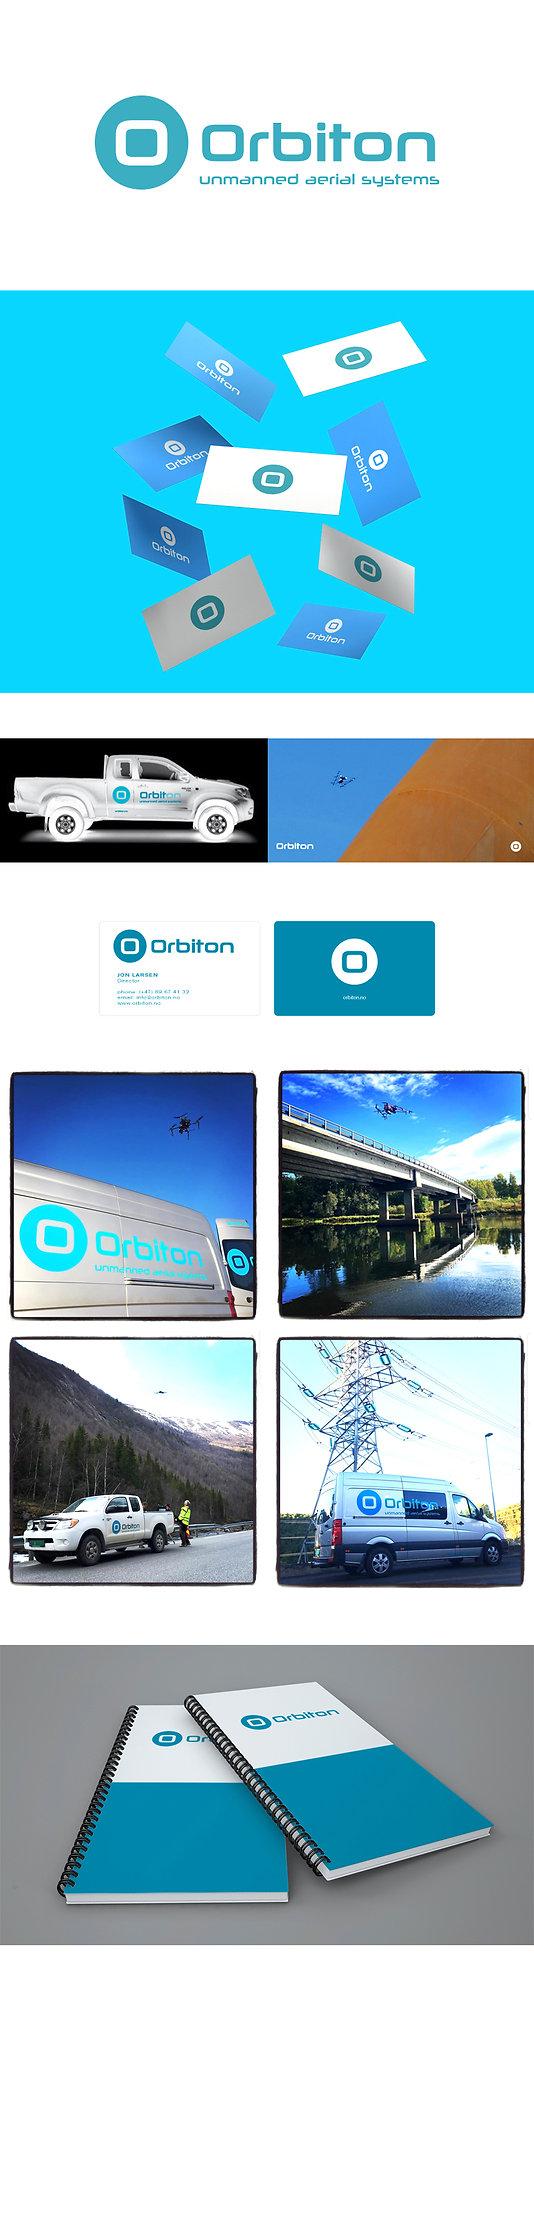 Orbiton.jpg